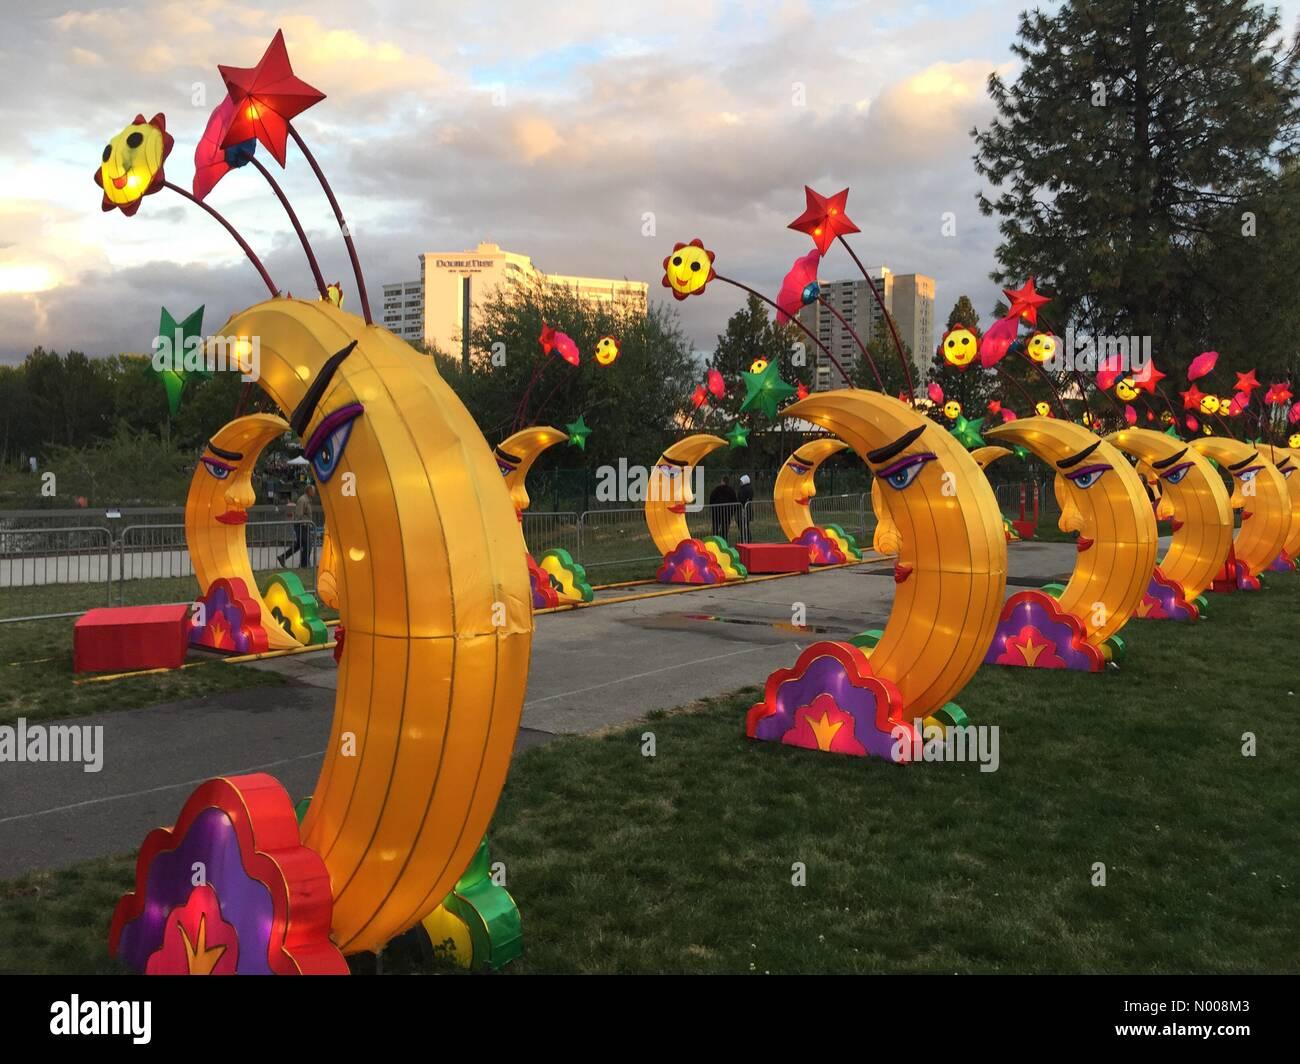 Spokane, Washington, USA. 17th Sep, 2016. Washington State Chinese Lantern Festival in Spokane Credit:  Katya Palladina/StockimoNews/Alamy Stock Photo